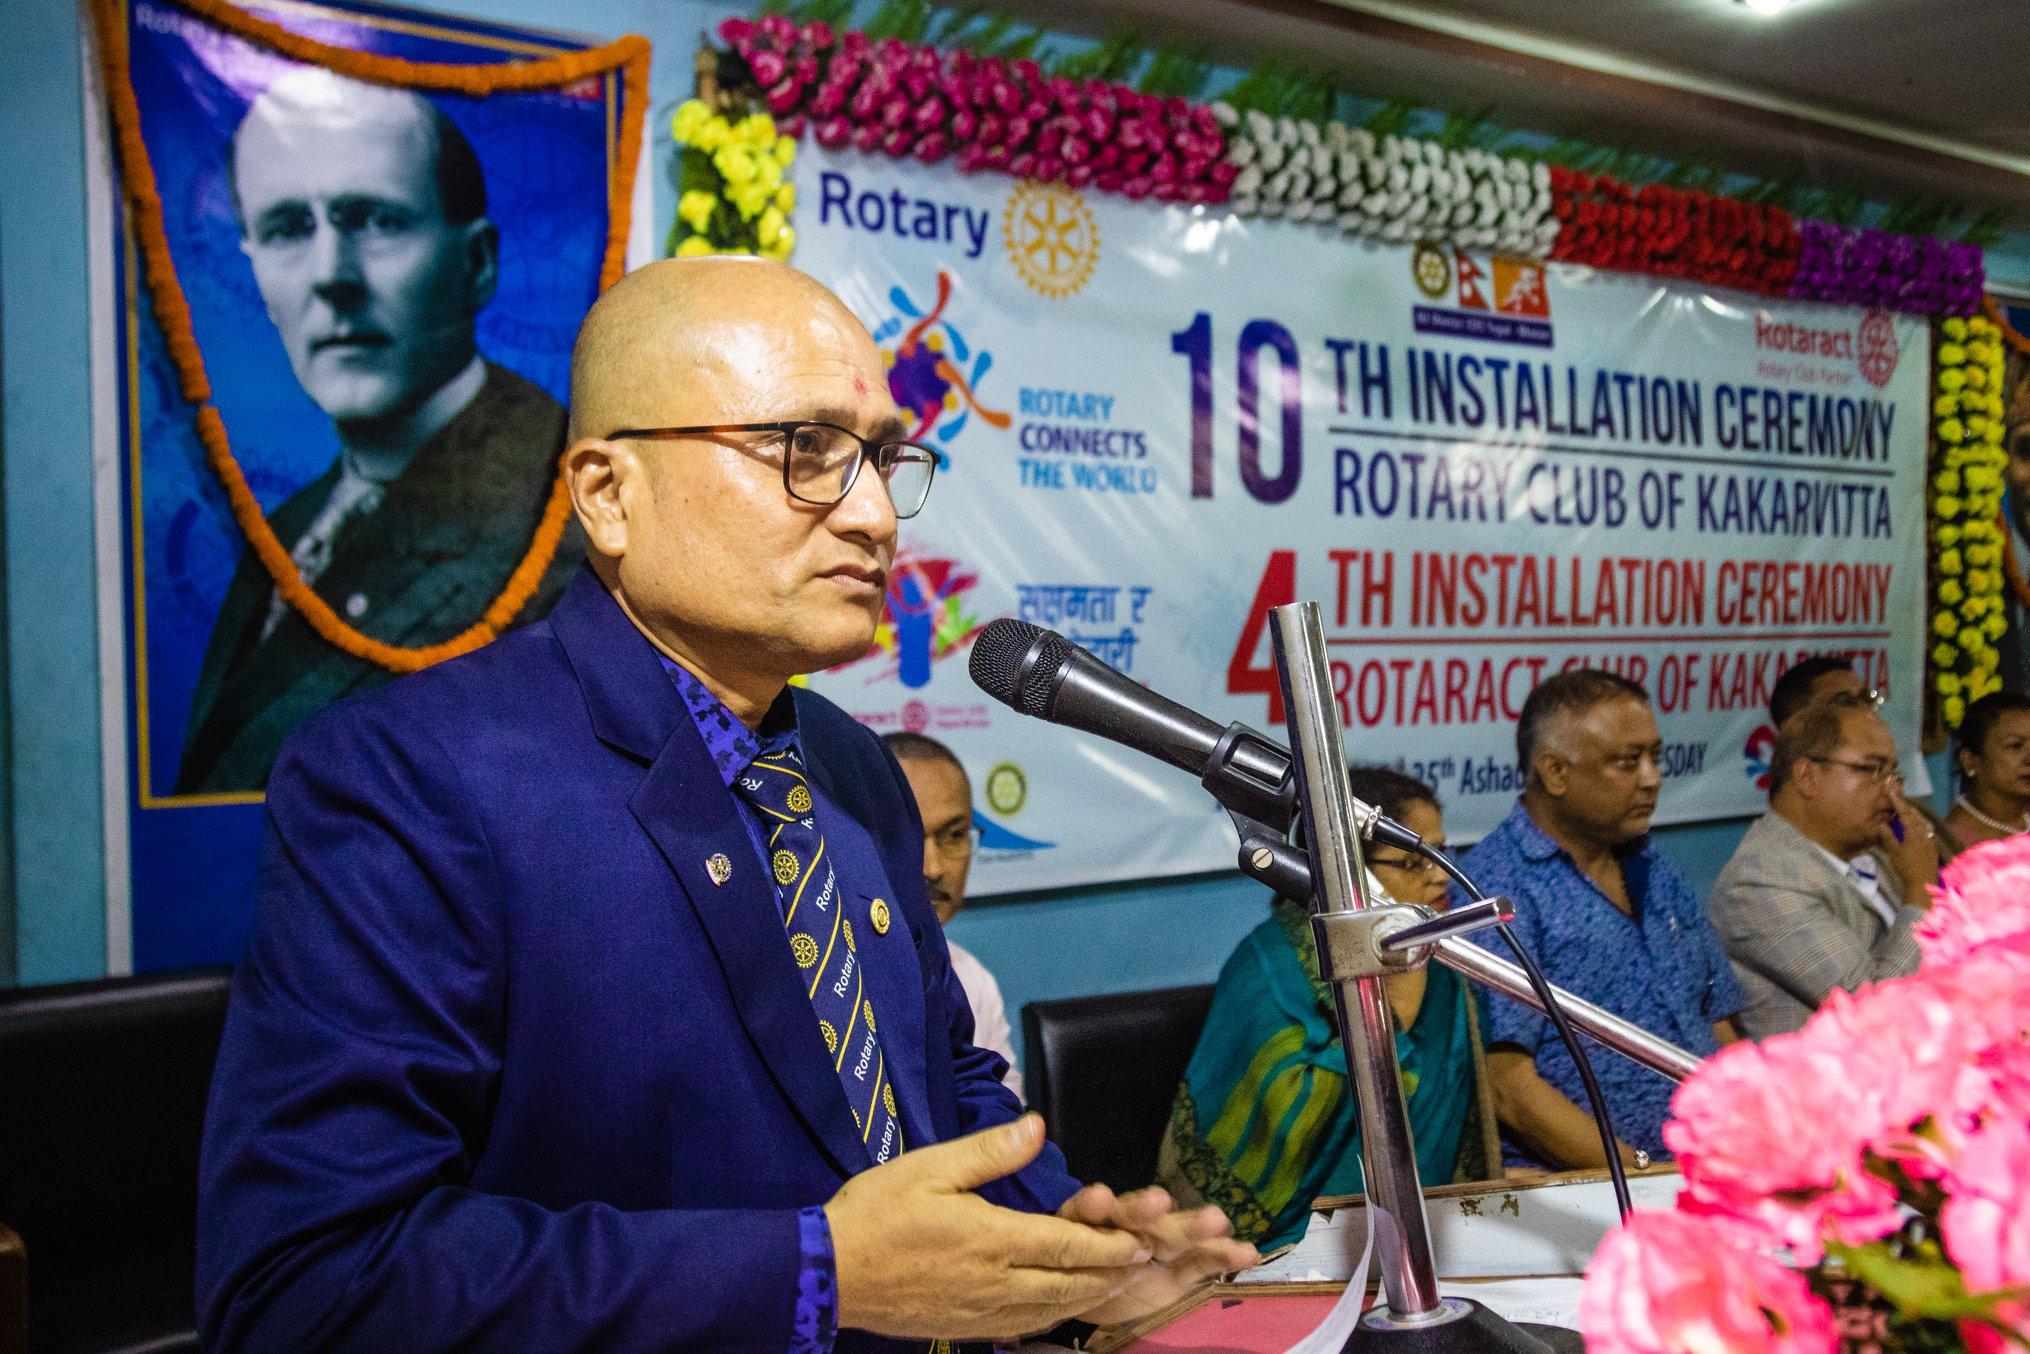 10th Installation Ceremony Rotary Club Of Kakarvitta 40